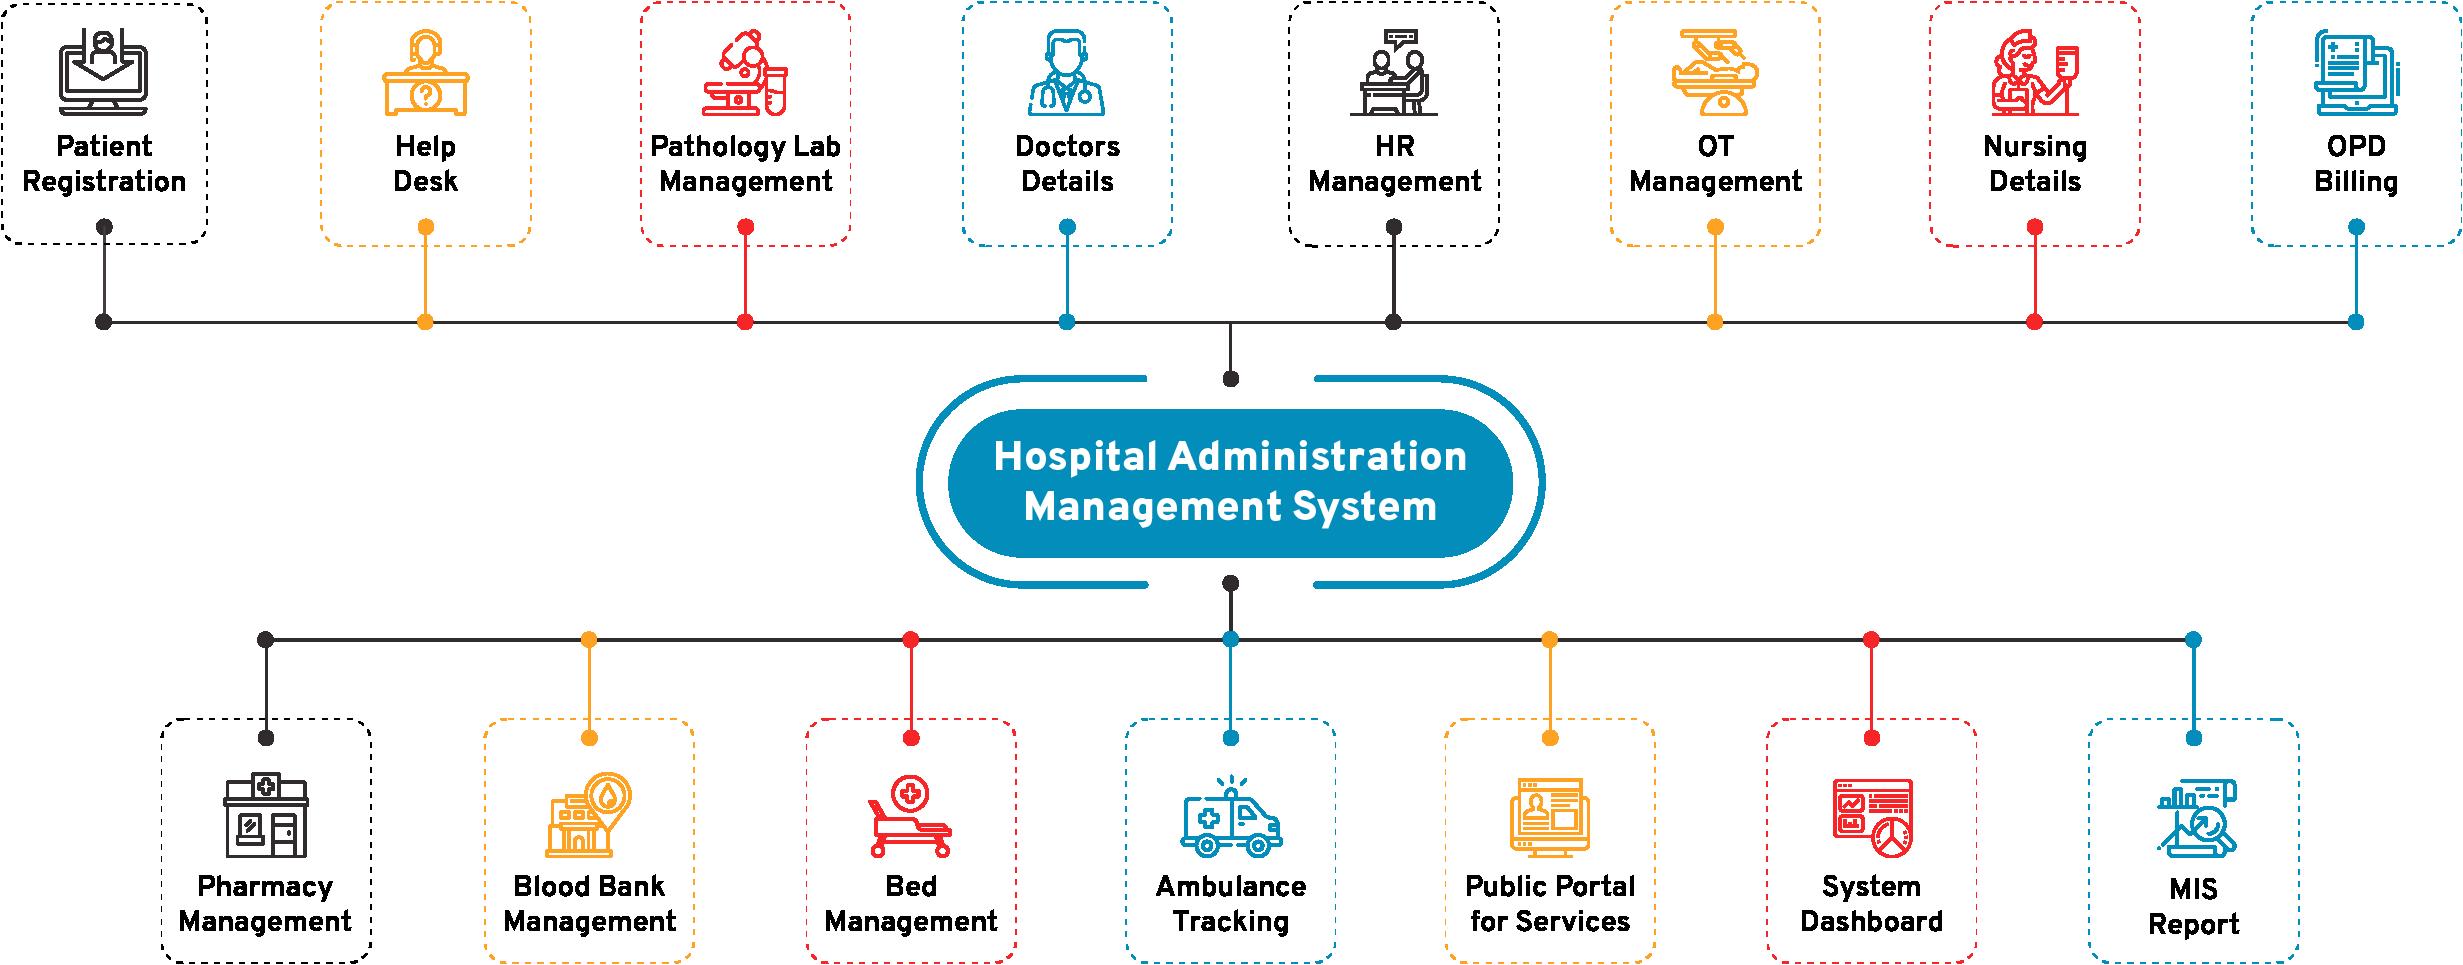 Hospital Administration Management System Flow Diagram - CSM Technologies